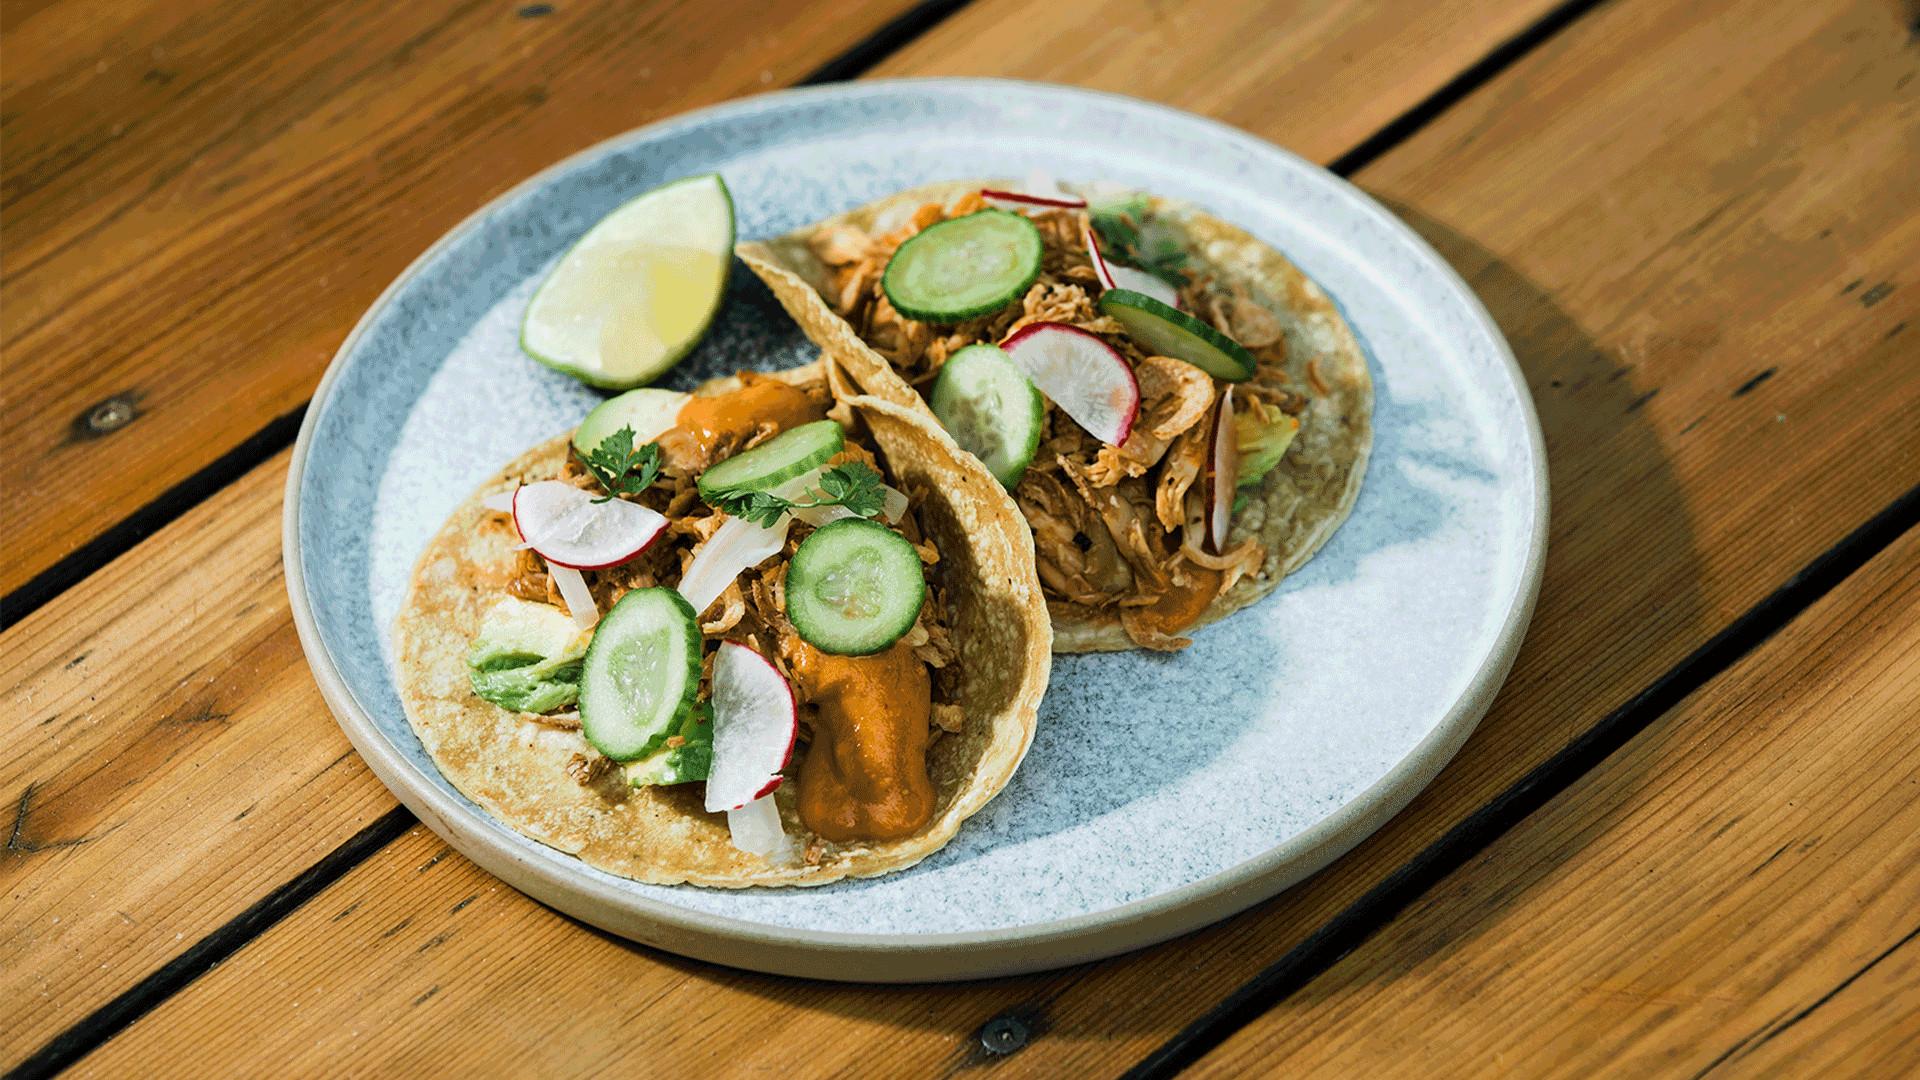 Toronto's best tacos | Tacos on the patio at El Rey Mezcal Bar in Kensington Market